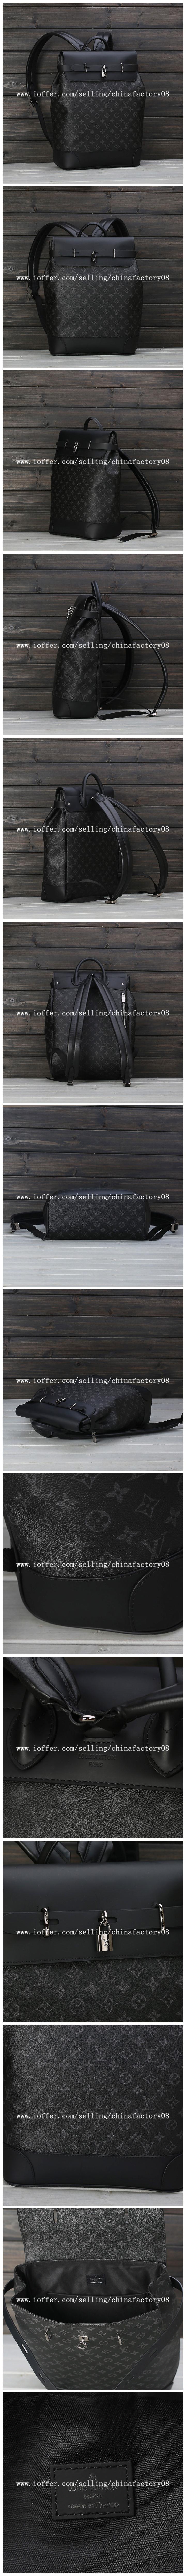 Mens Eclipse Steamer Backpack Travel Back Pack M44052 For Sale Hanvin Pochette 25 Green Bamboo 1 32 X 45 16 Cm 199 Ems 219